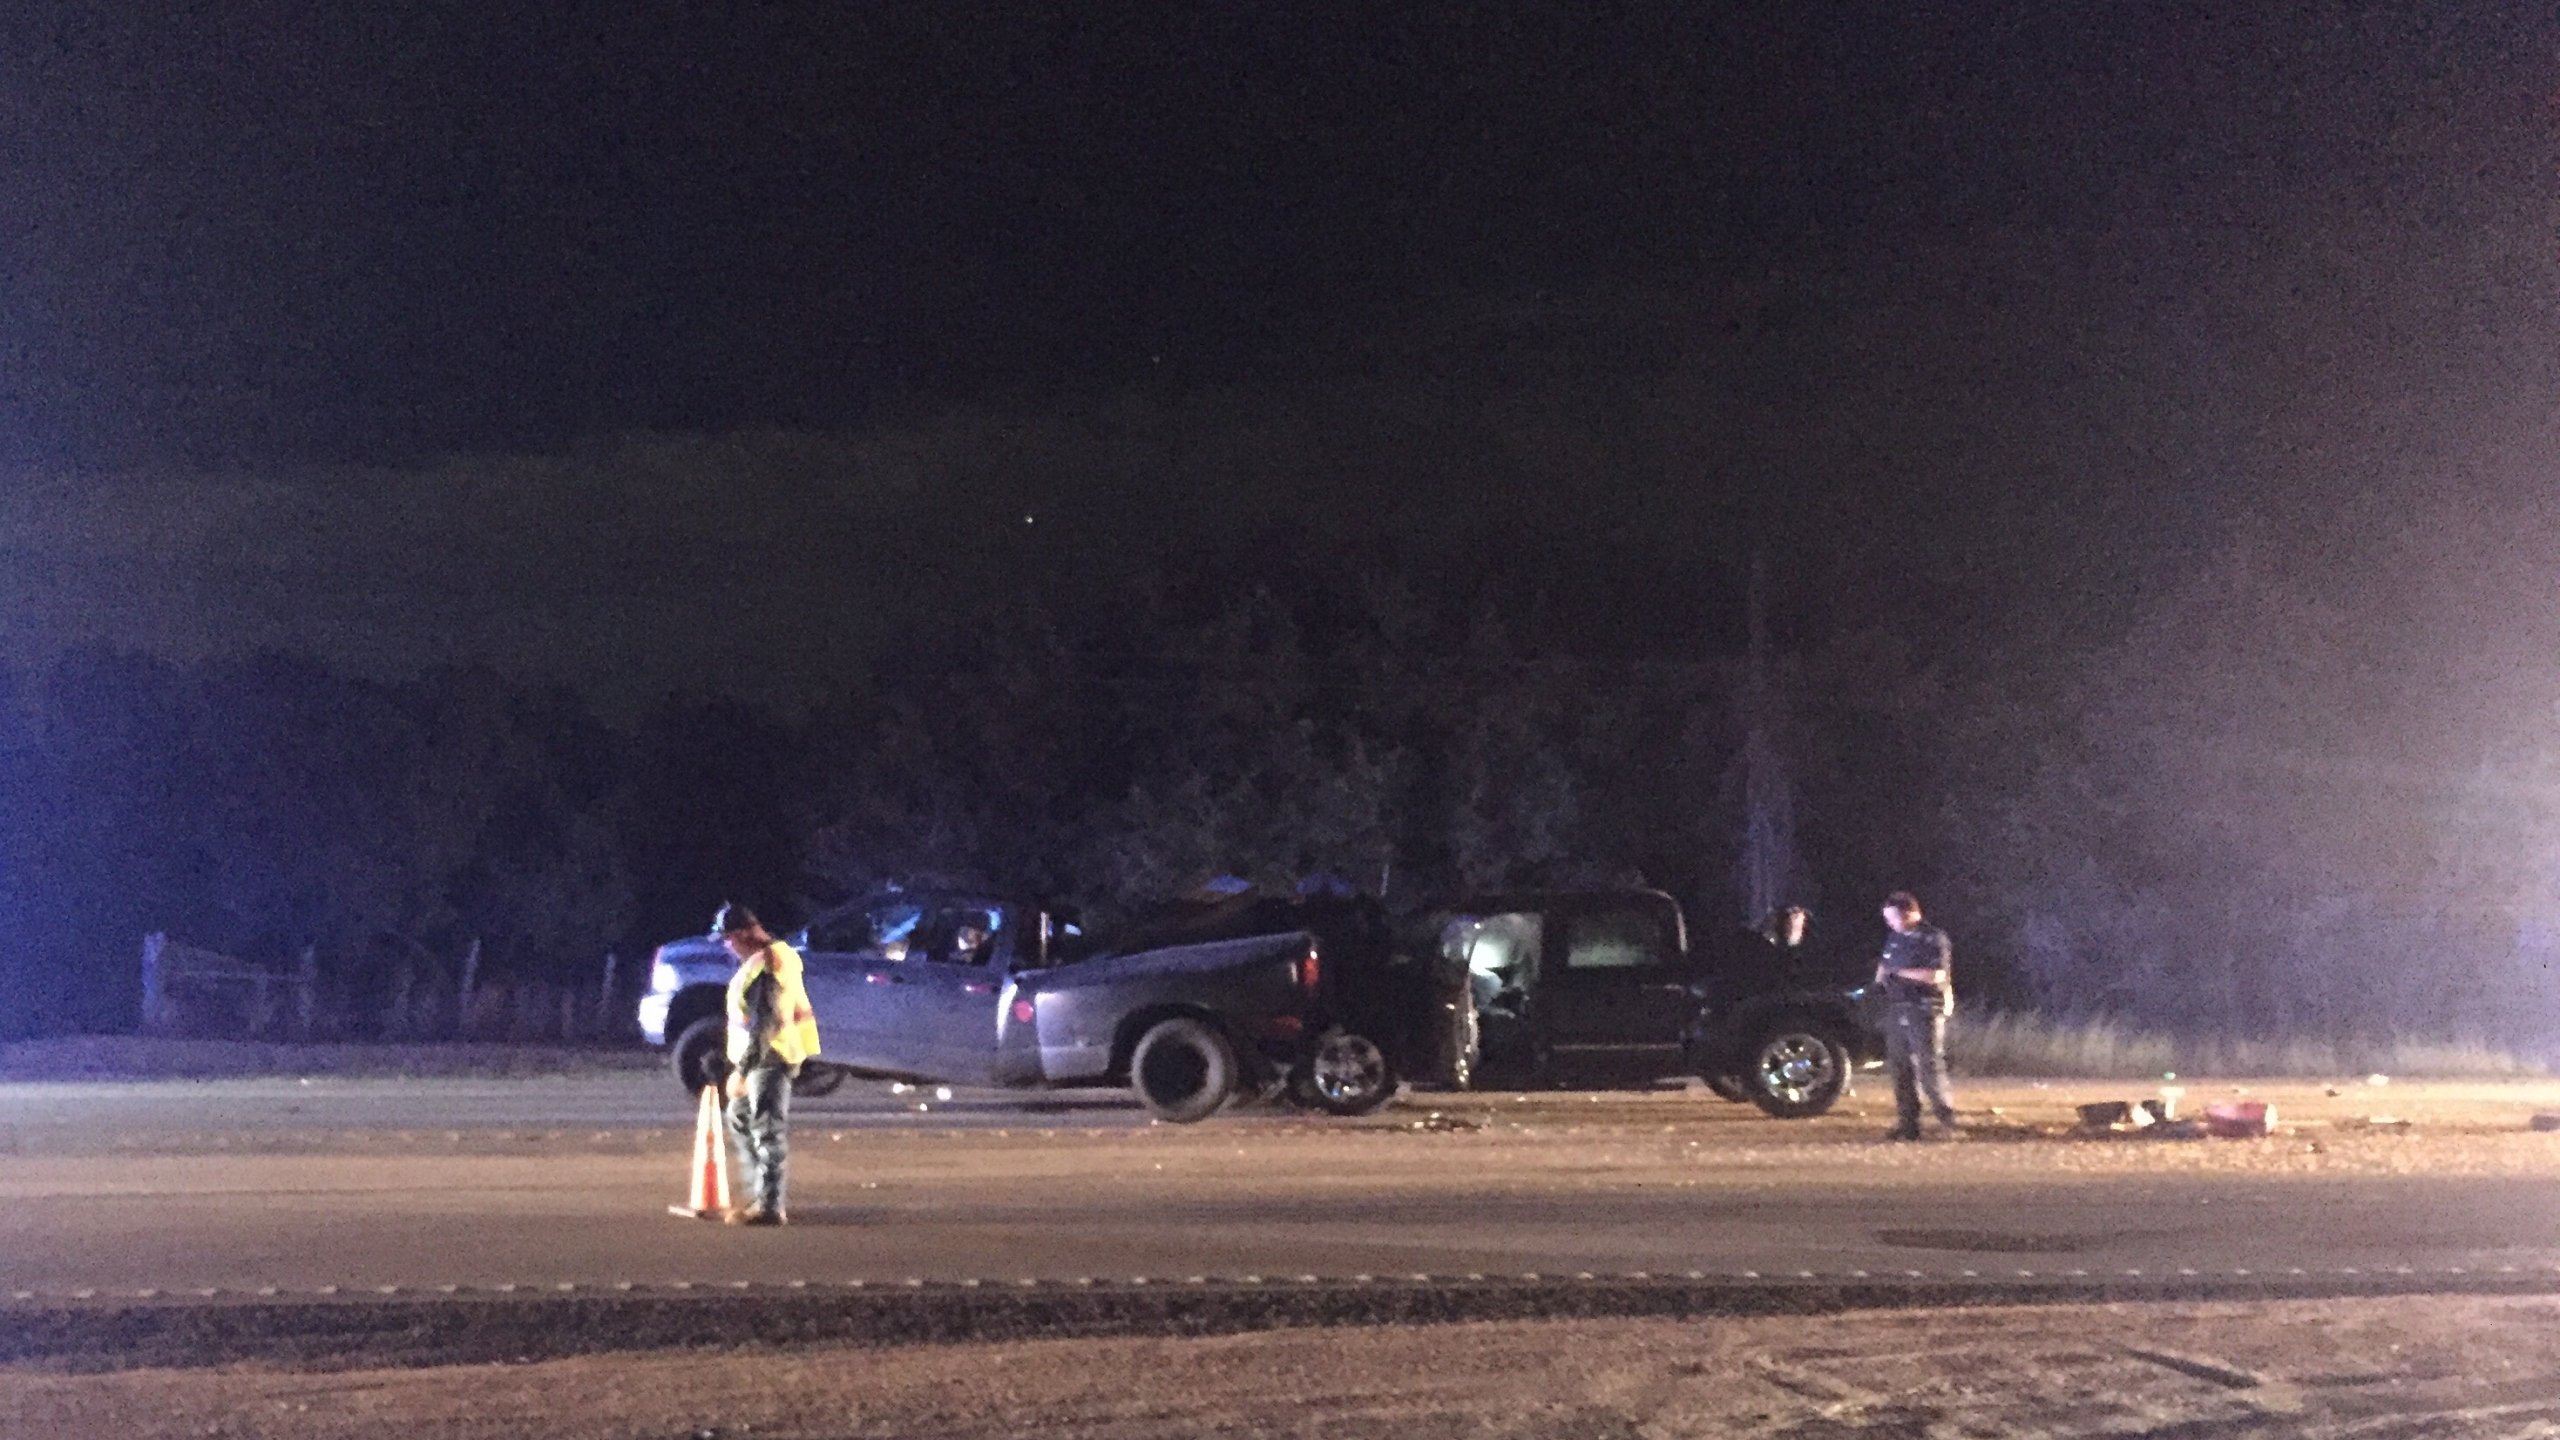 US 281 back open near Johnson City after crash